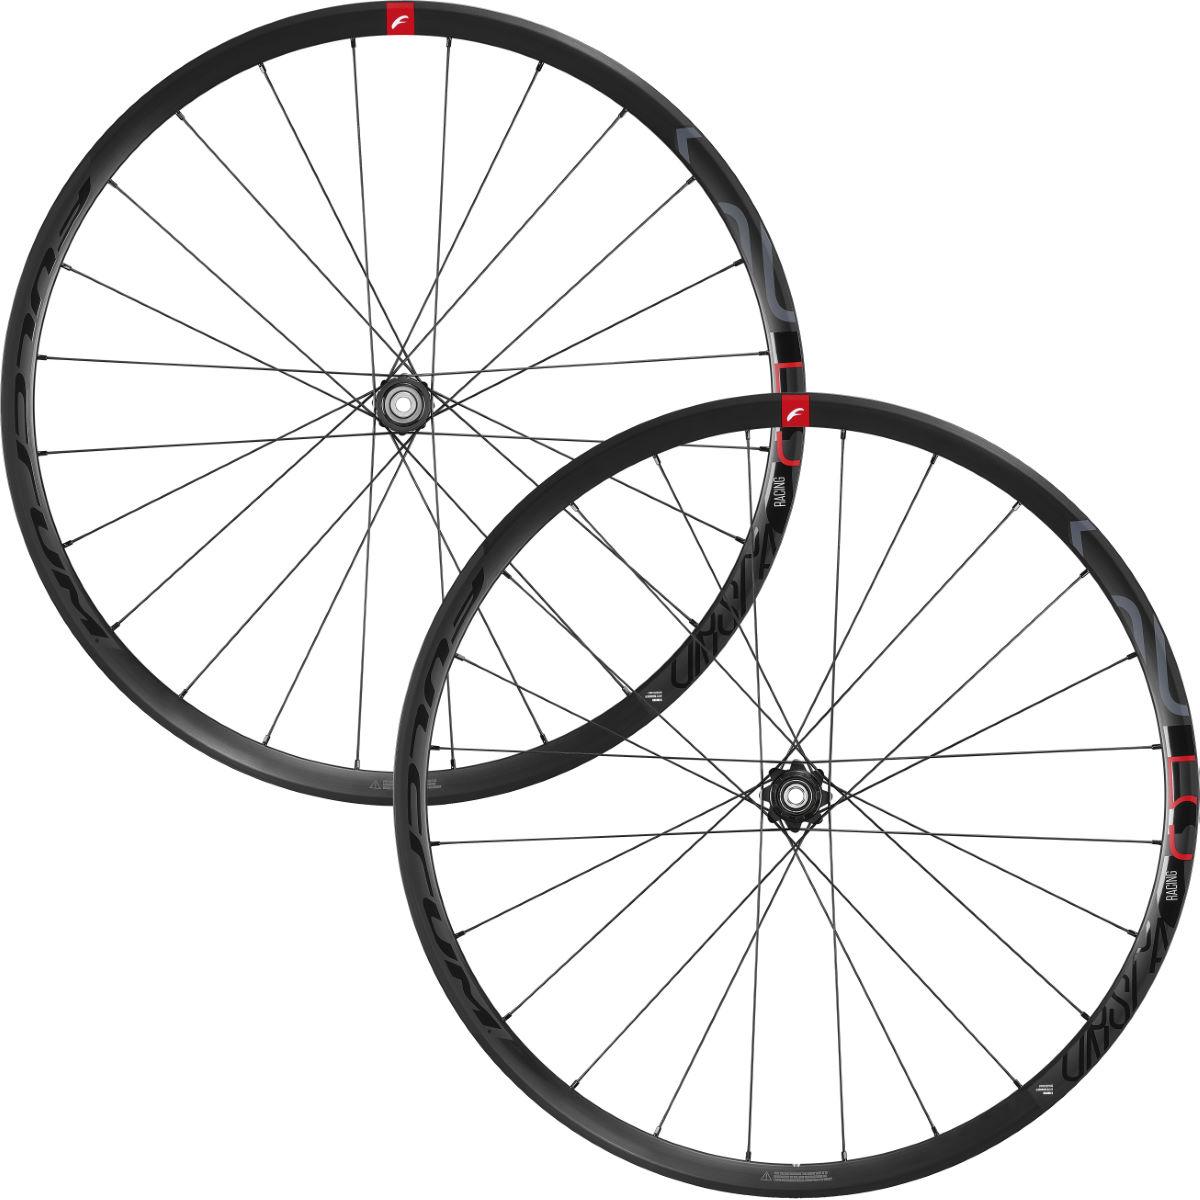 Fulcrum Racing 5 DB Disc Wheelset Wheel Sets